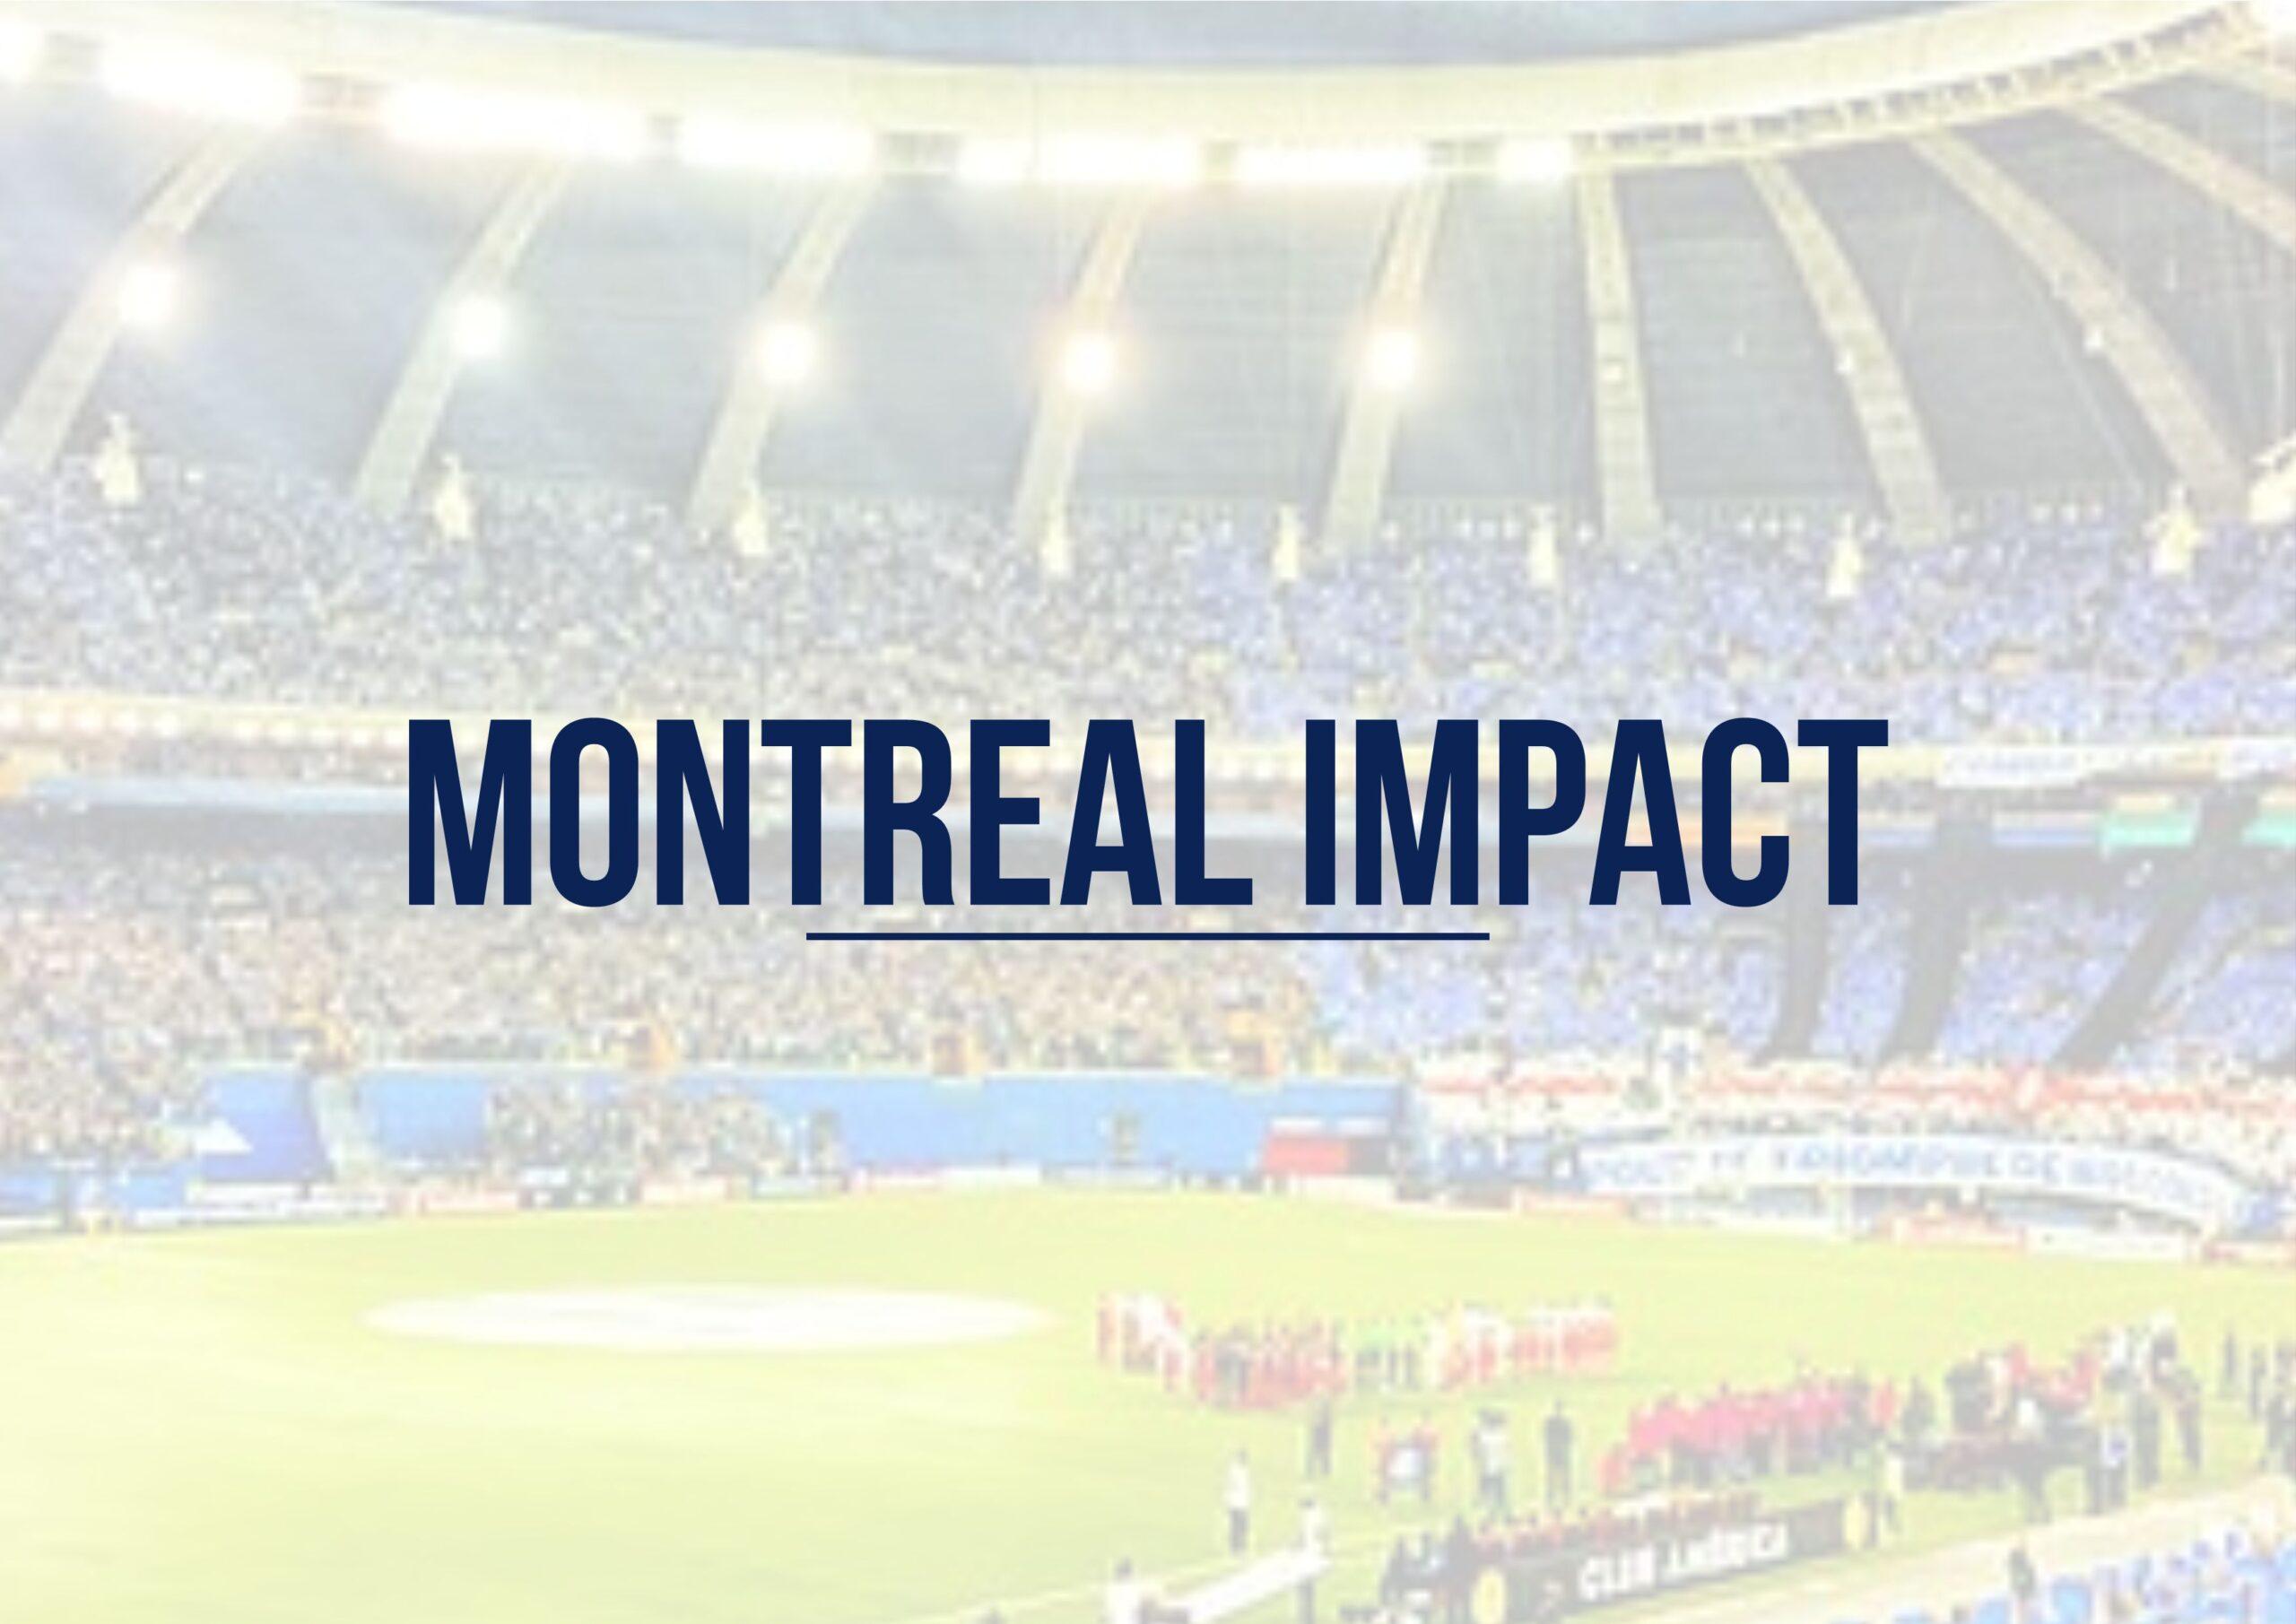 Montreal Impact MLS | MLS Magazine Italia